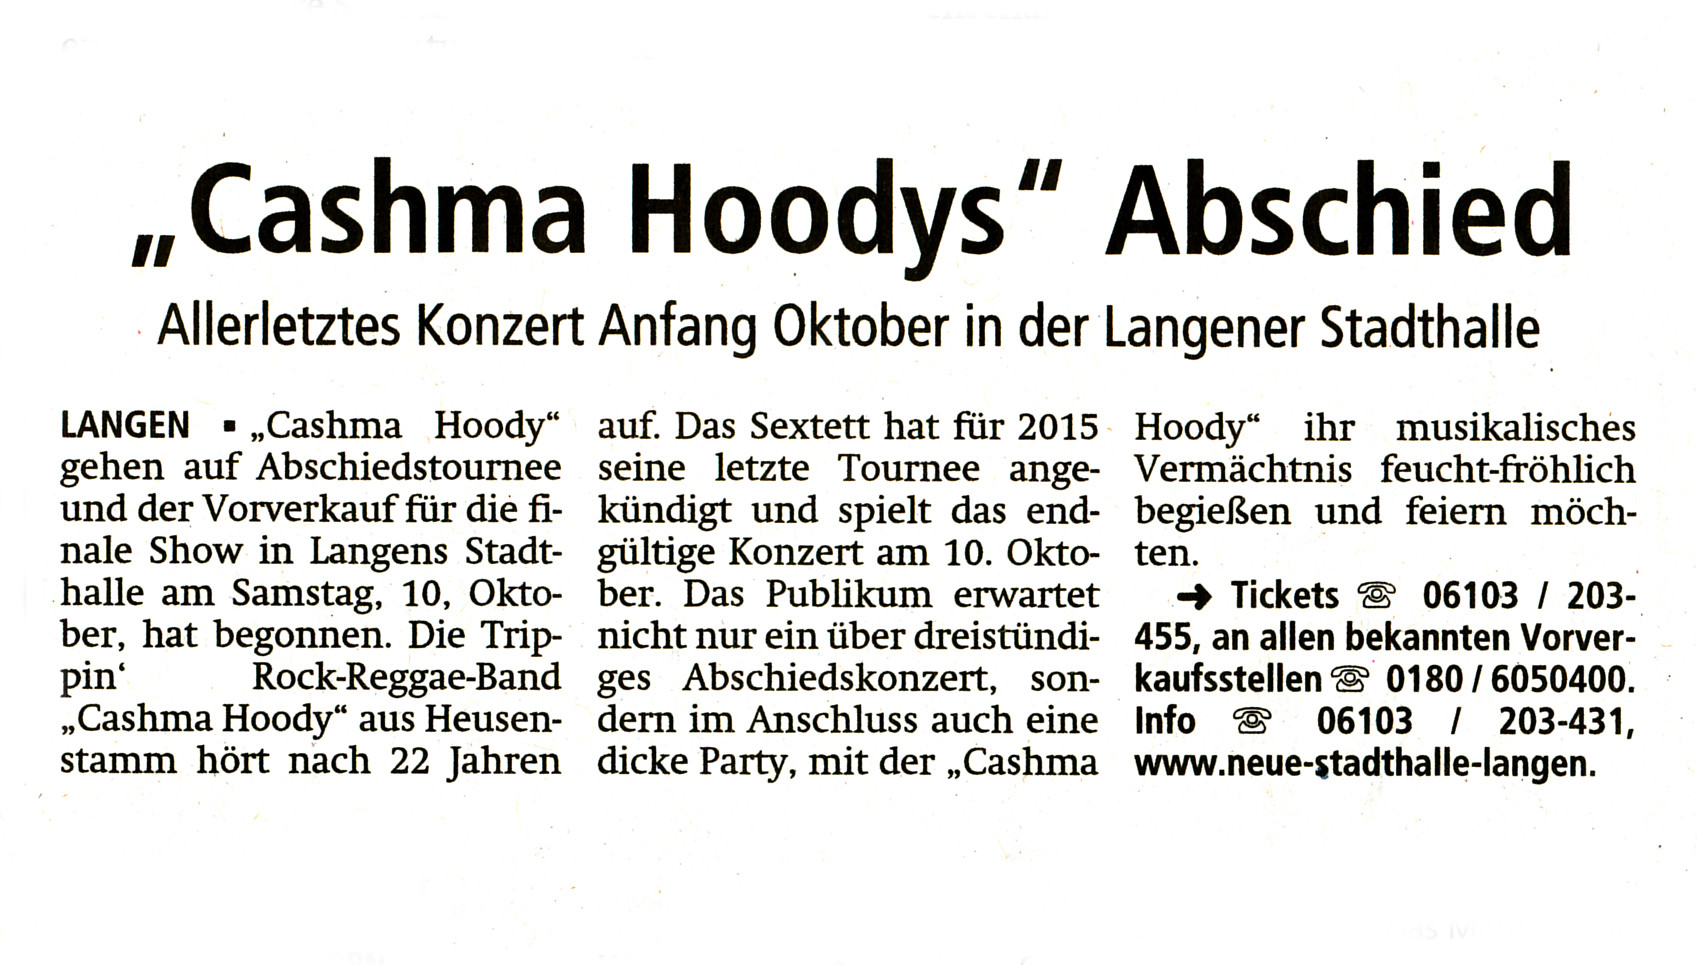 Offenbach Post, 24. März 2015